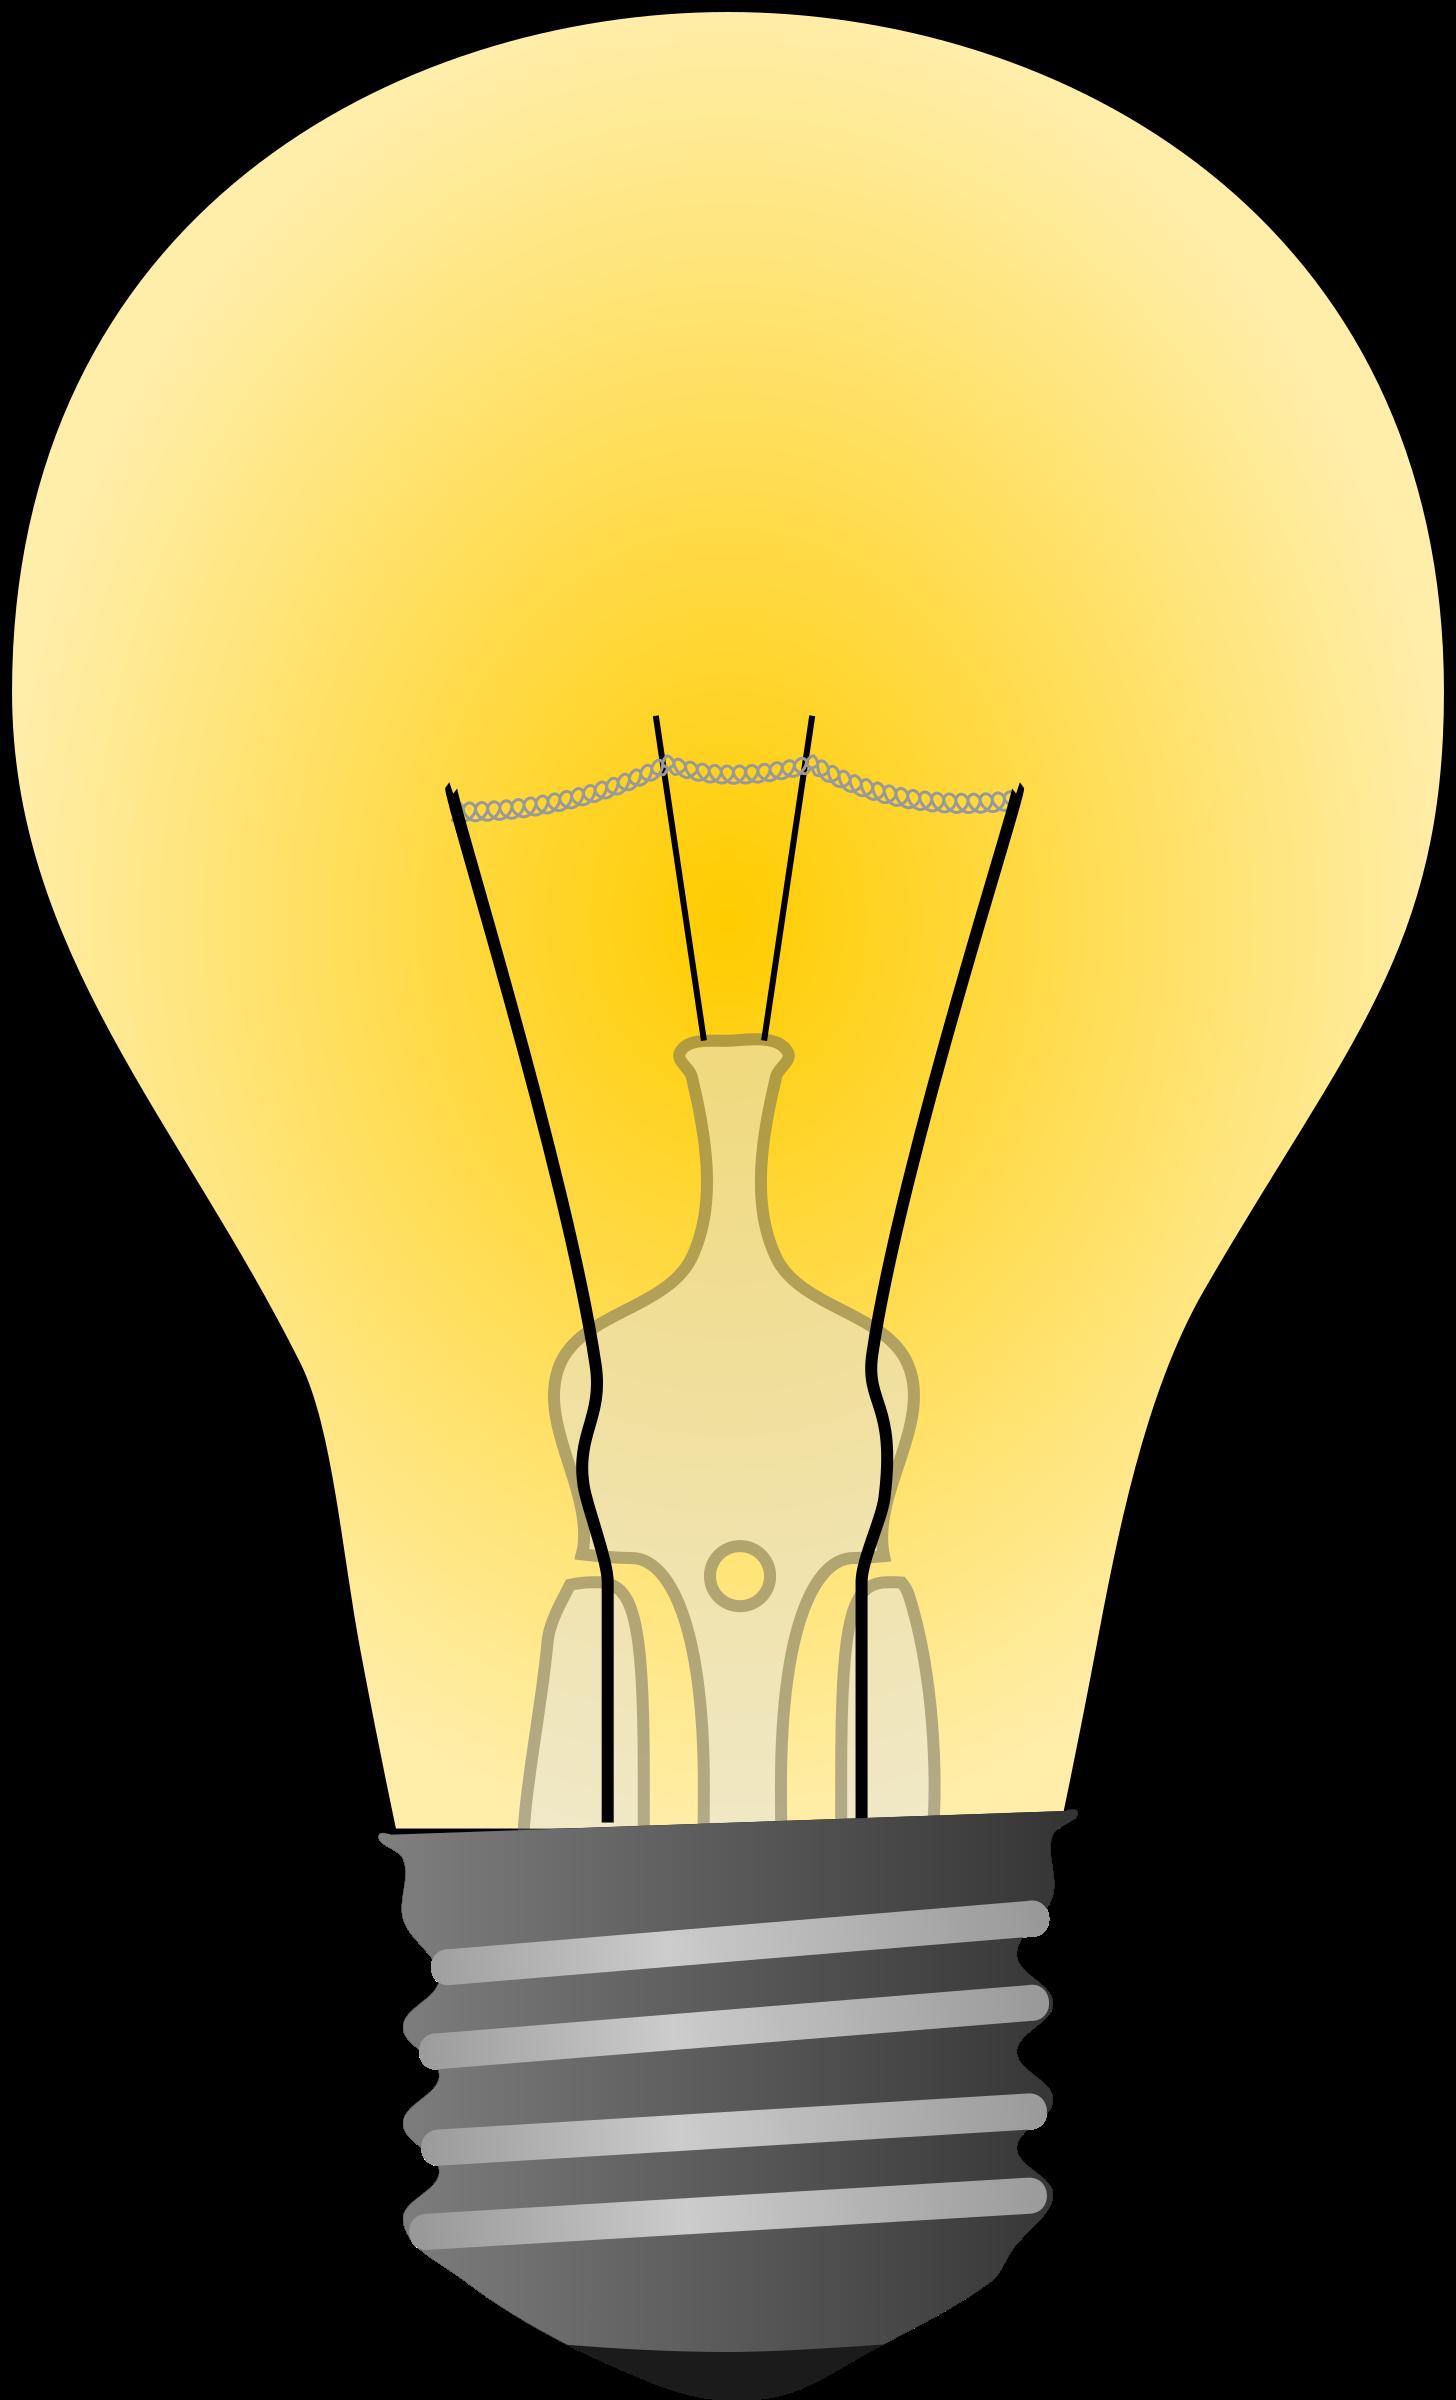 Light clipart bolb, Light bolb Transparent FREE for download.